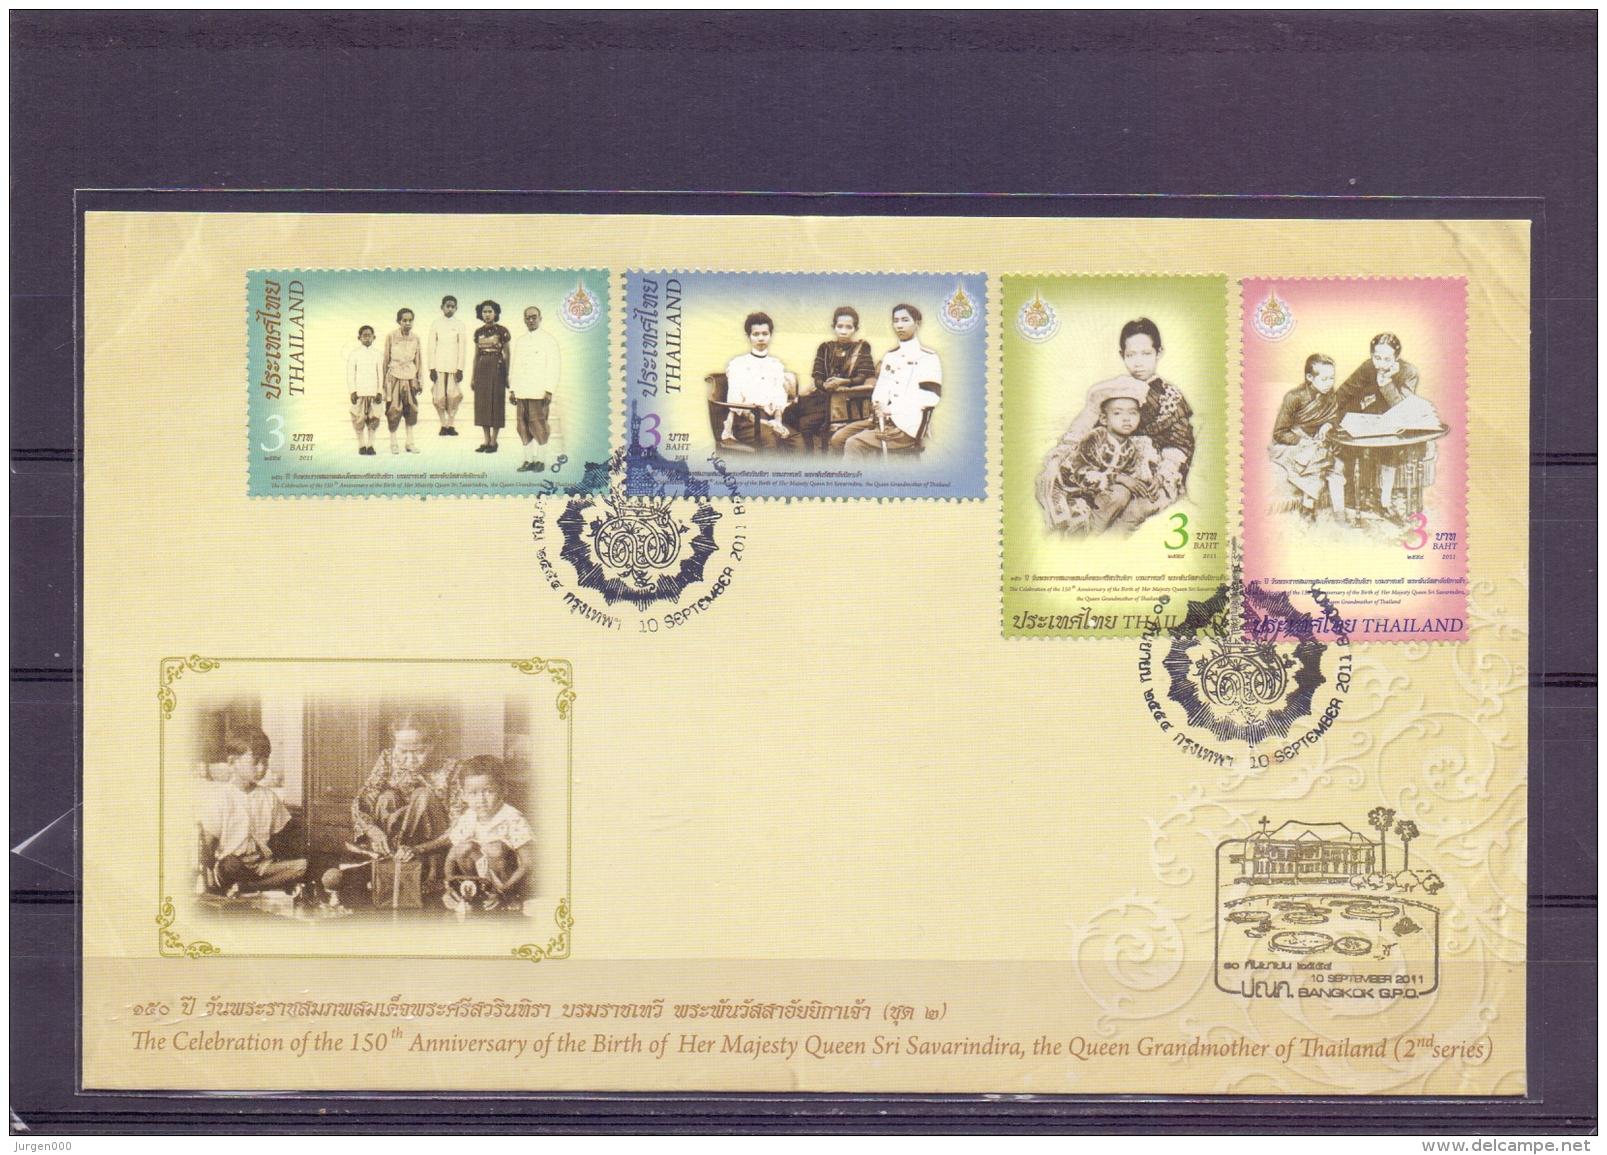 Celebration 150th Anniversary BVirth Queen Sri Savarindira - FDC - Michel 3113-16 - Bangkok 10/9/2011  (RM13719) - Thaïlande